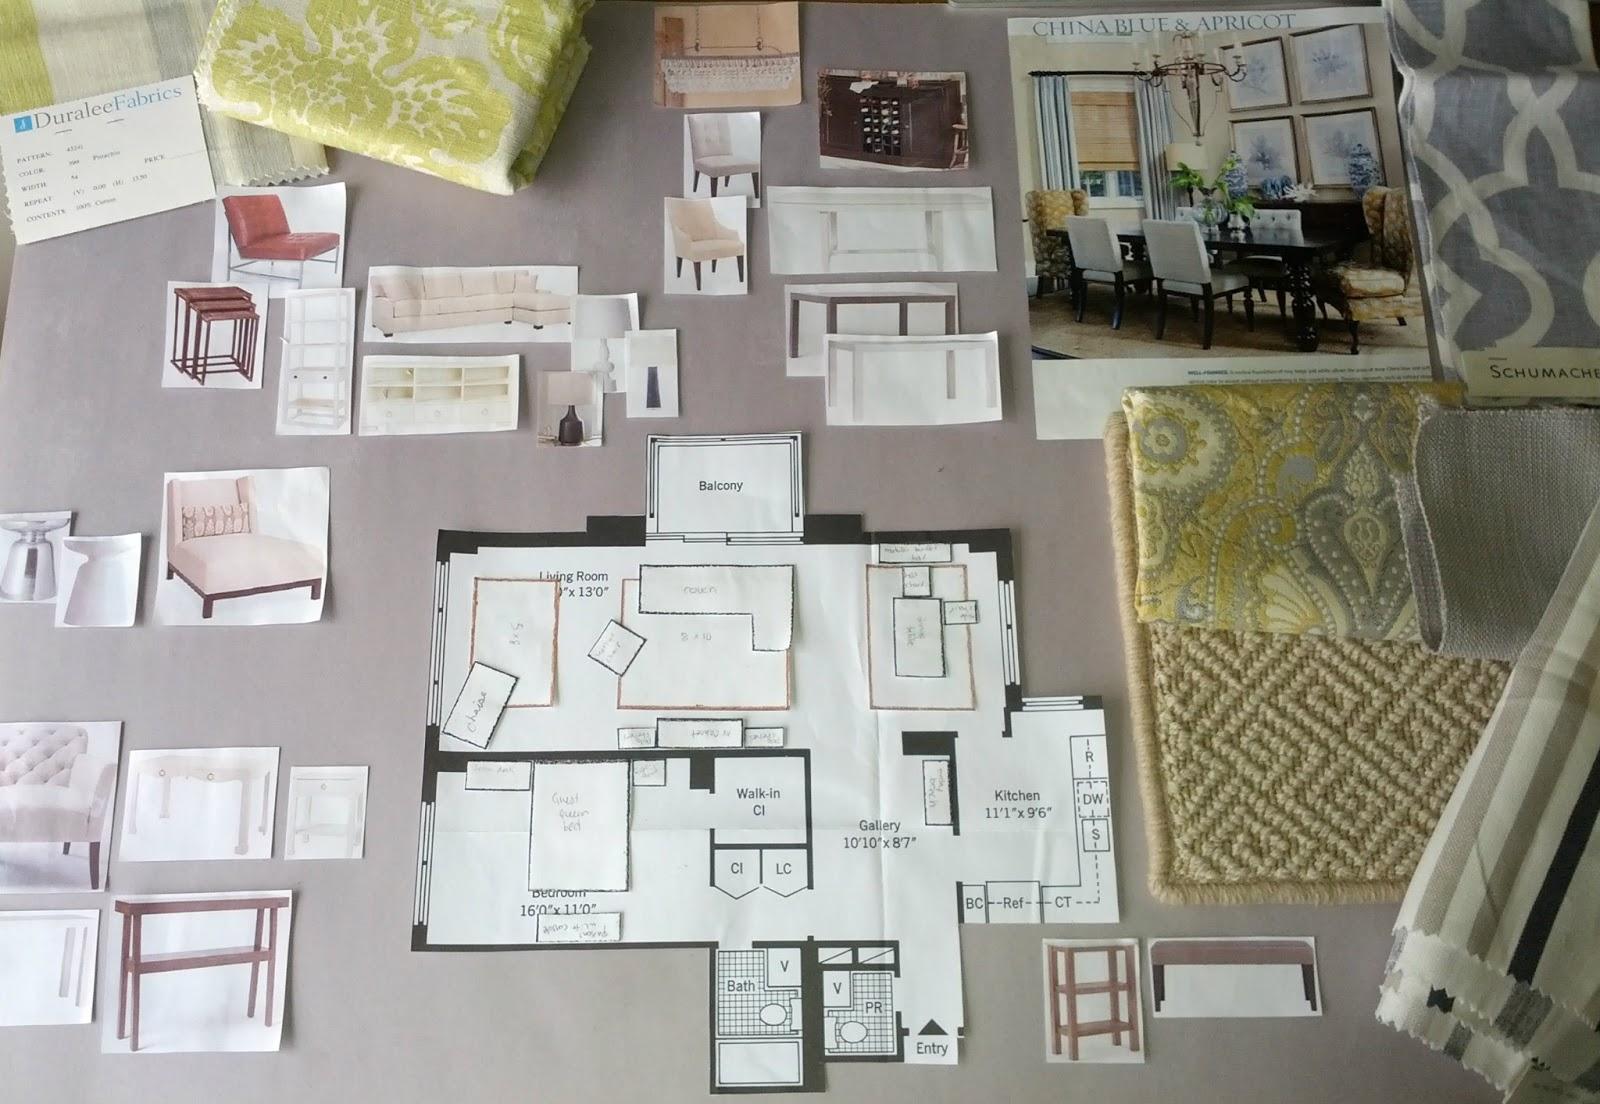 Design Your Dreams: Creating an Interior Design Board